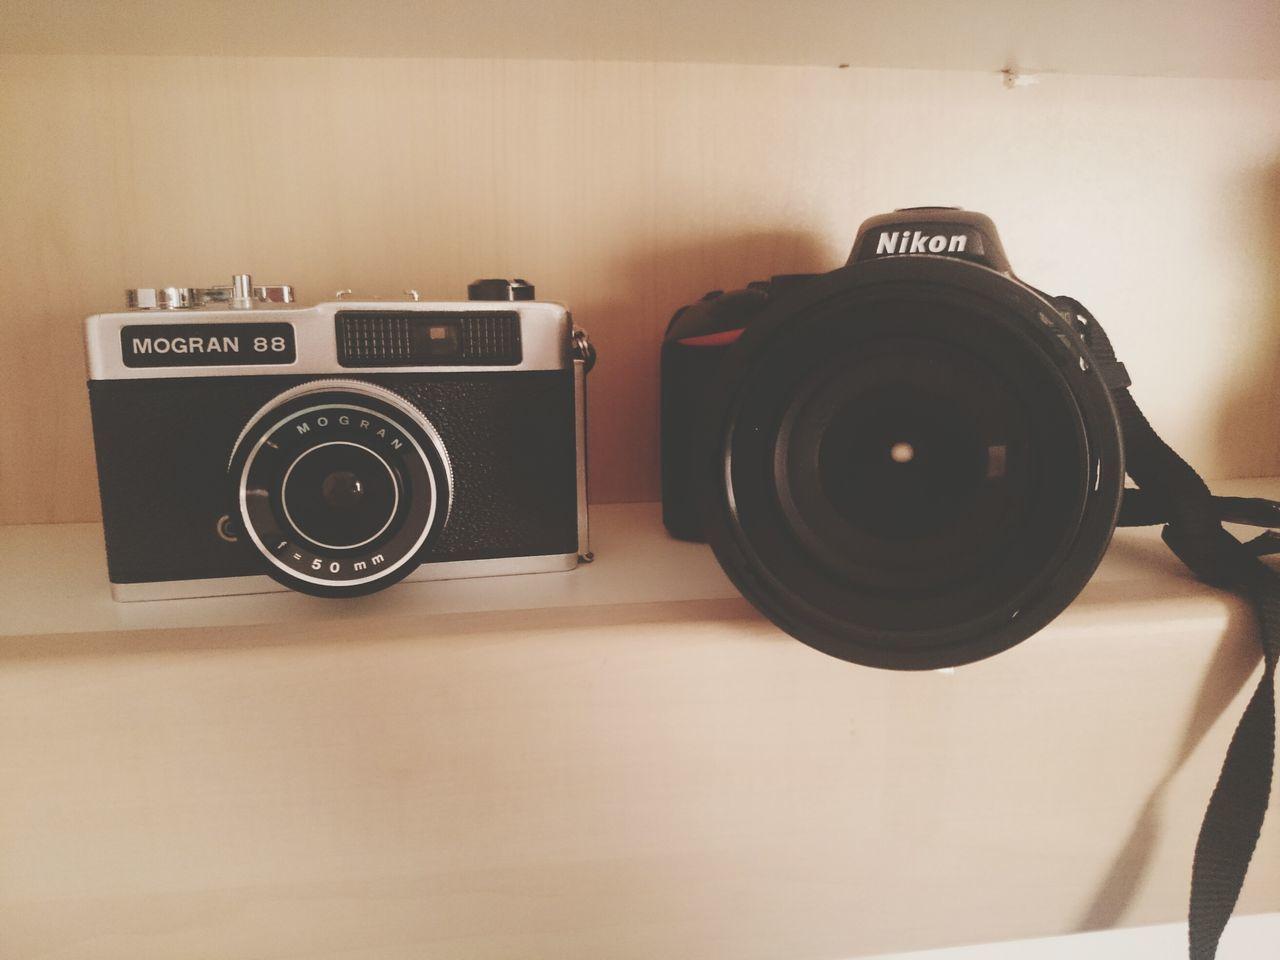 Vintage Camera vs Nikon Old Vs New New Technology Old School Analog Camera Analog Vs Digital Camera Generations Morgan Camera My Cameras Things I Like